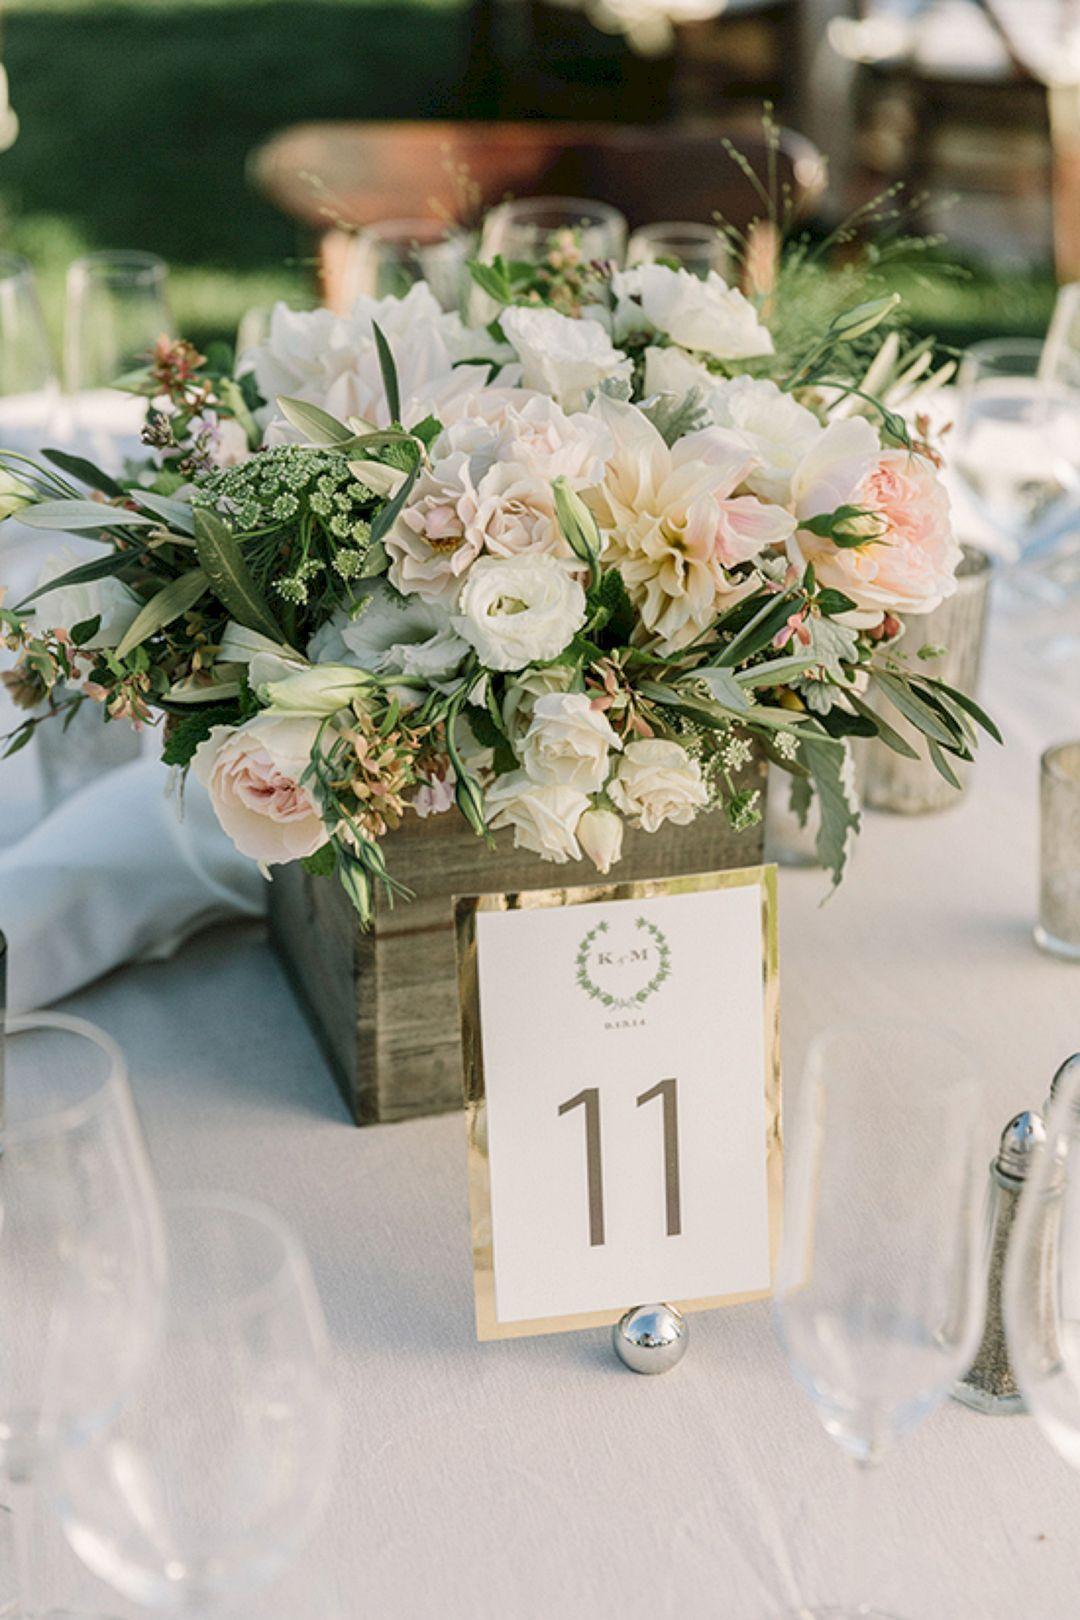 diy creative rustic chic wedding centerpieces ideas u oosile